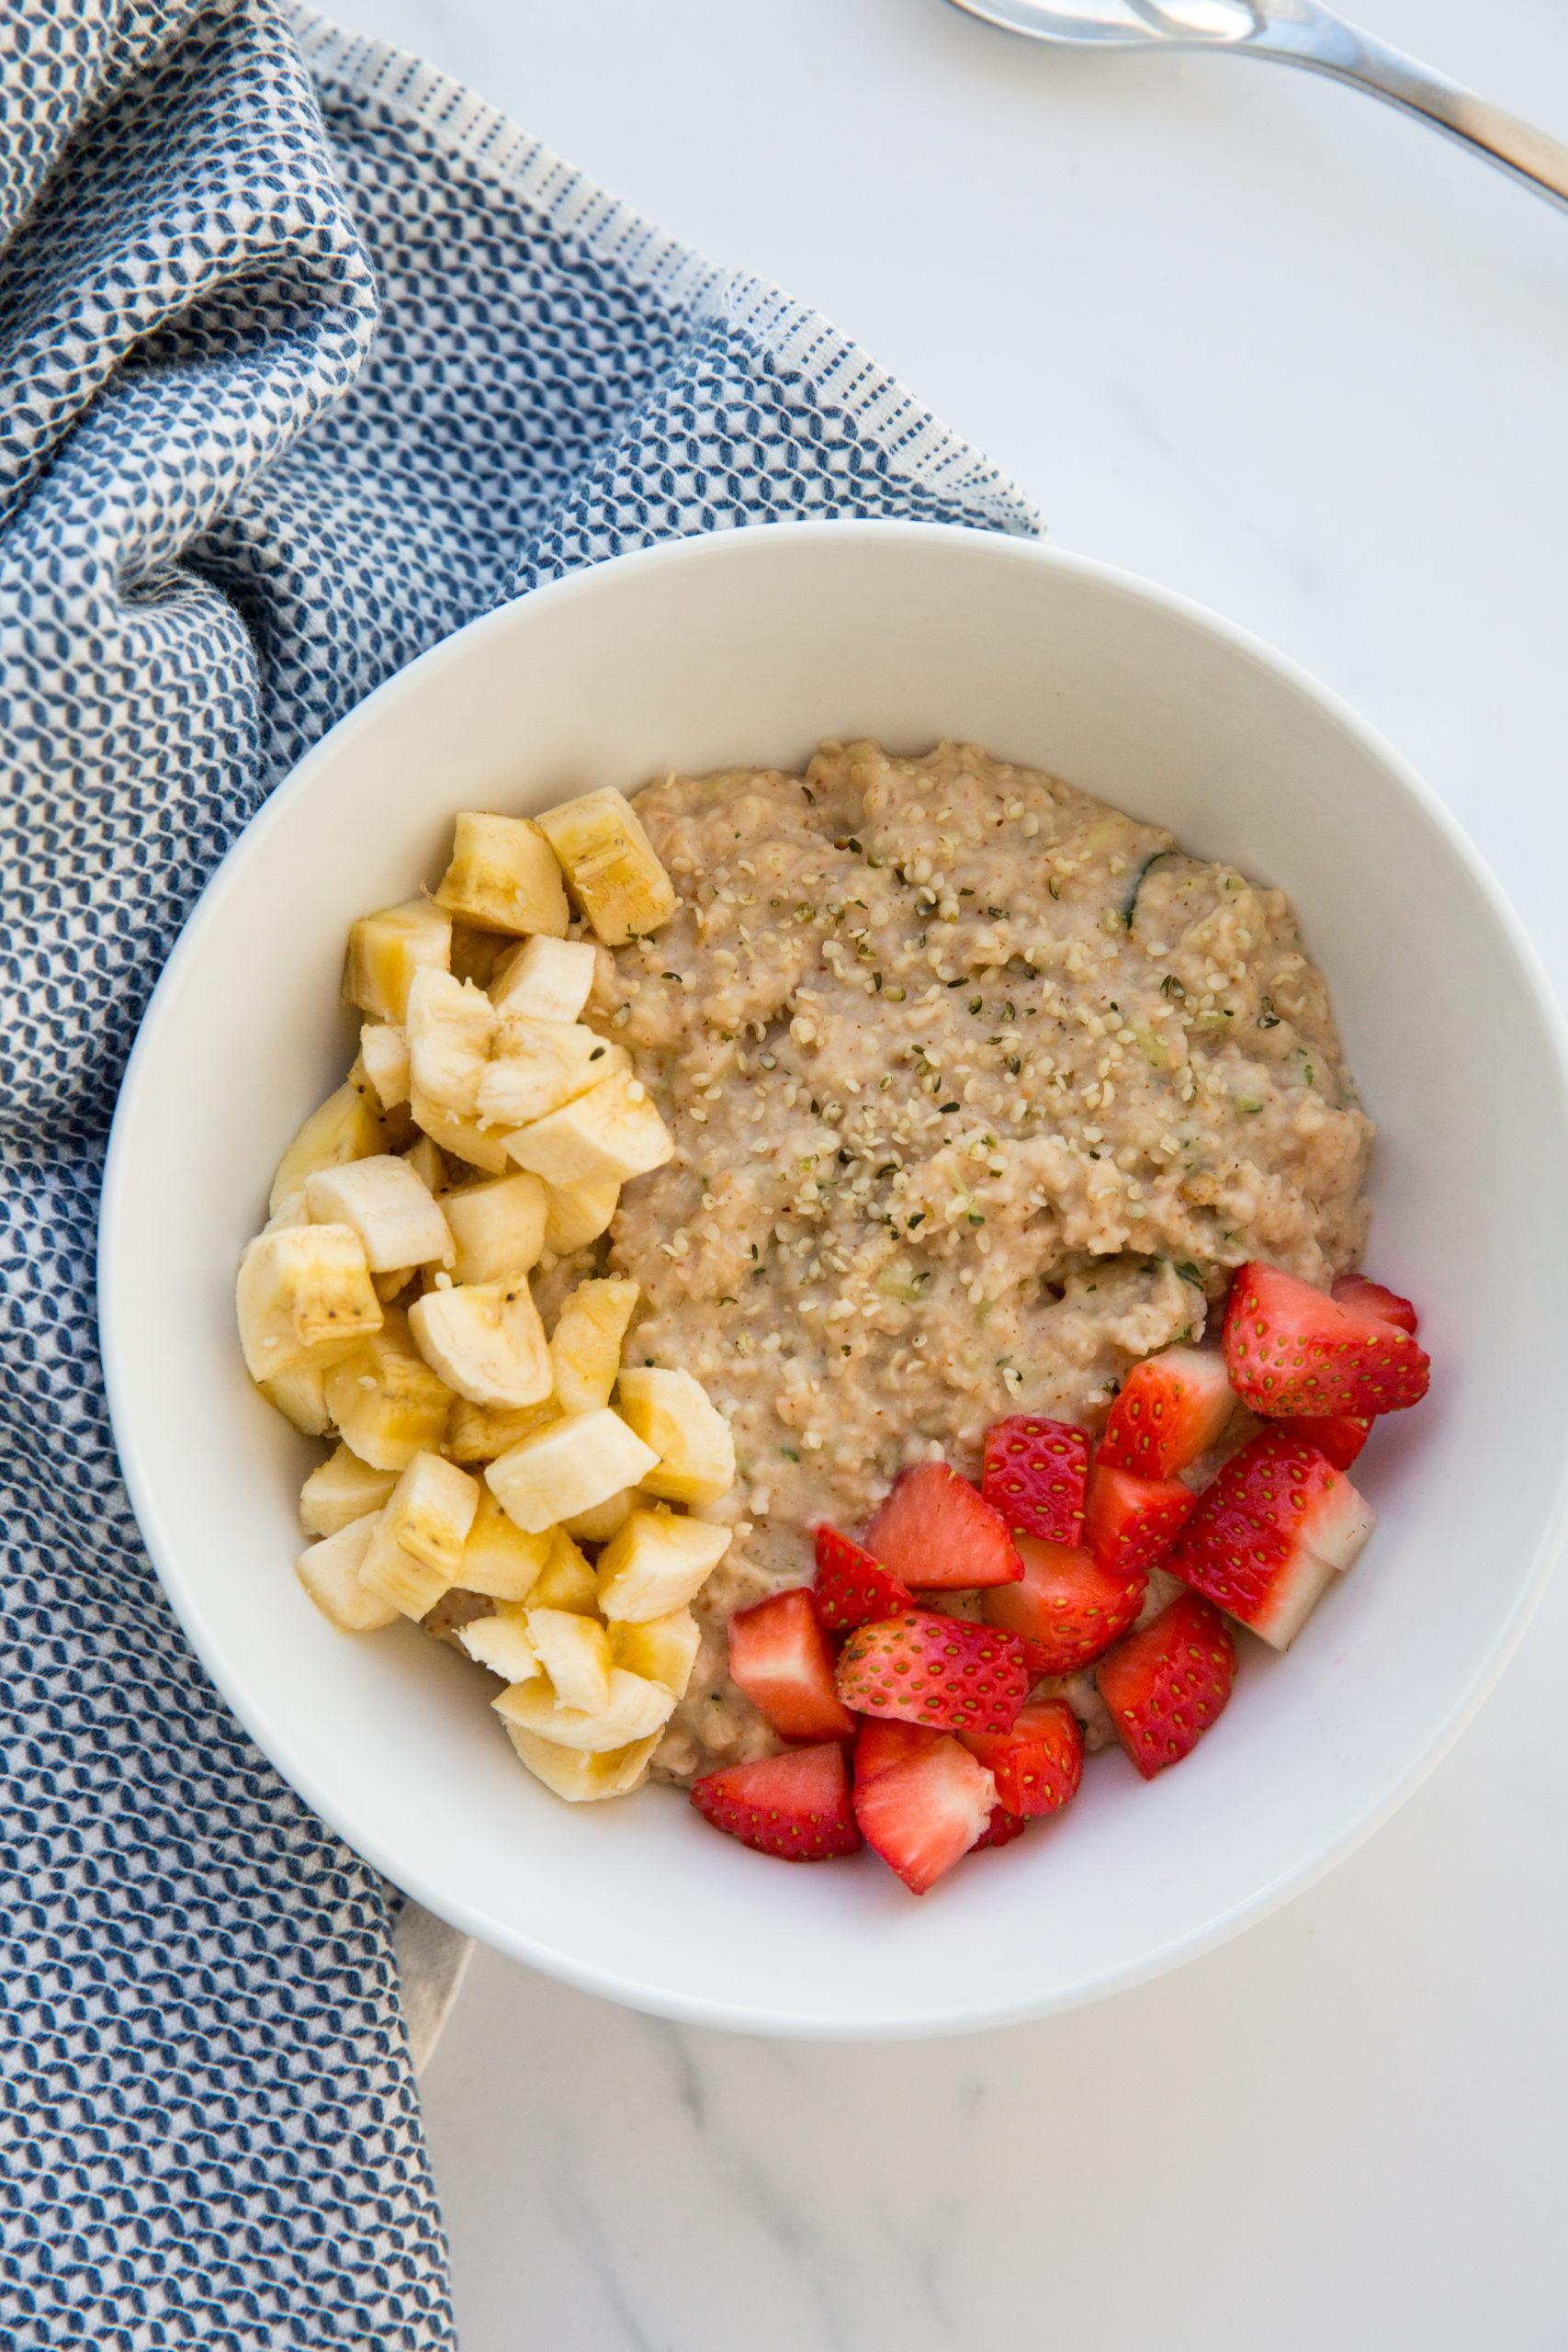 Zucchini Oatmeal Bowl